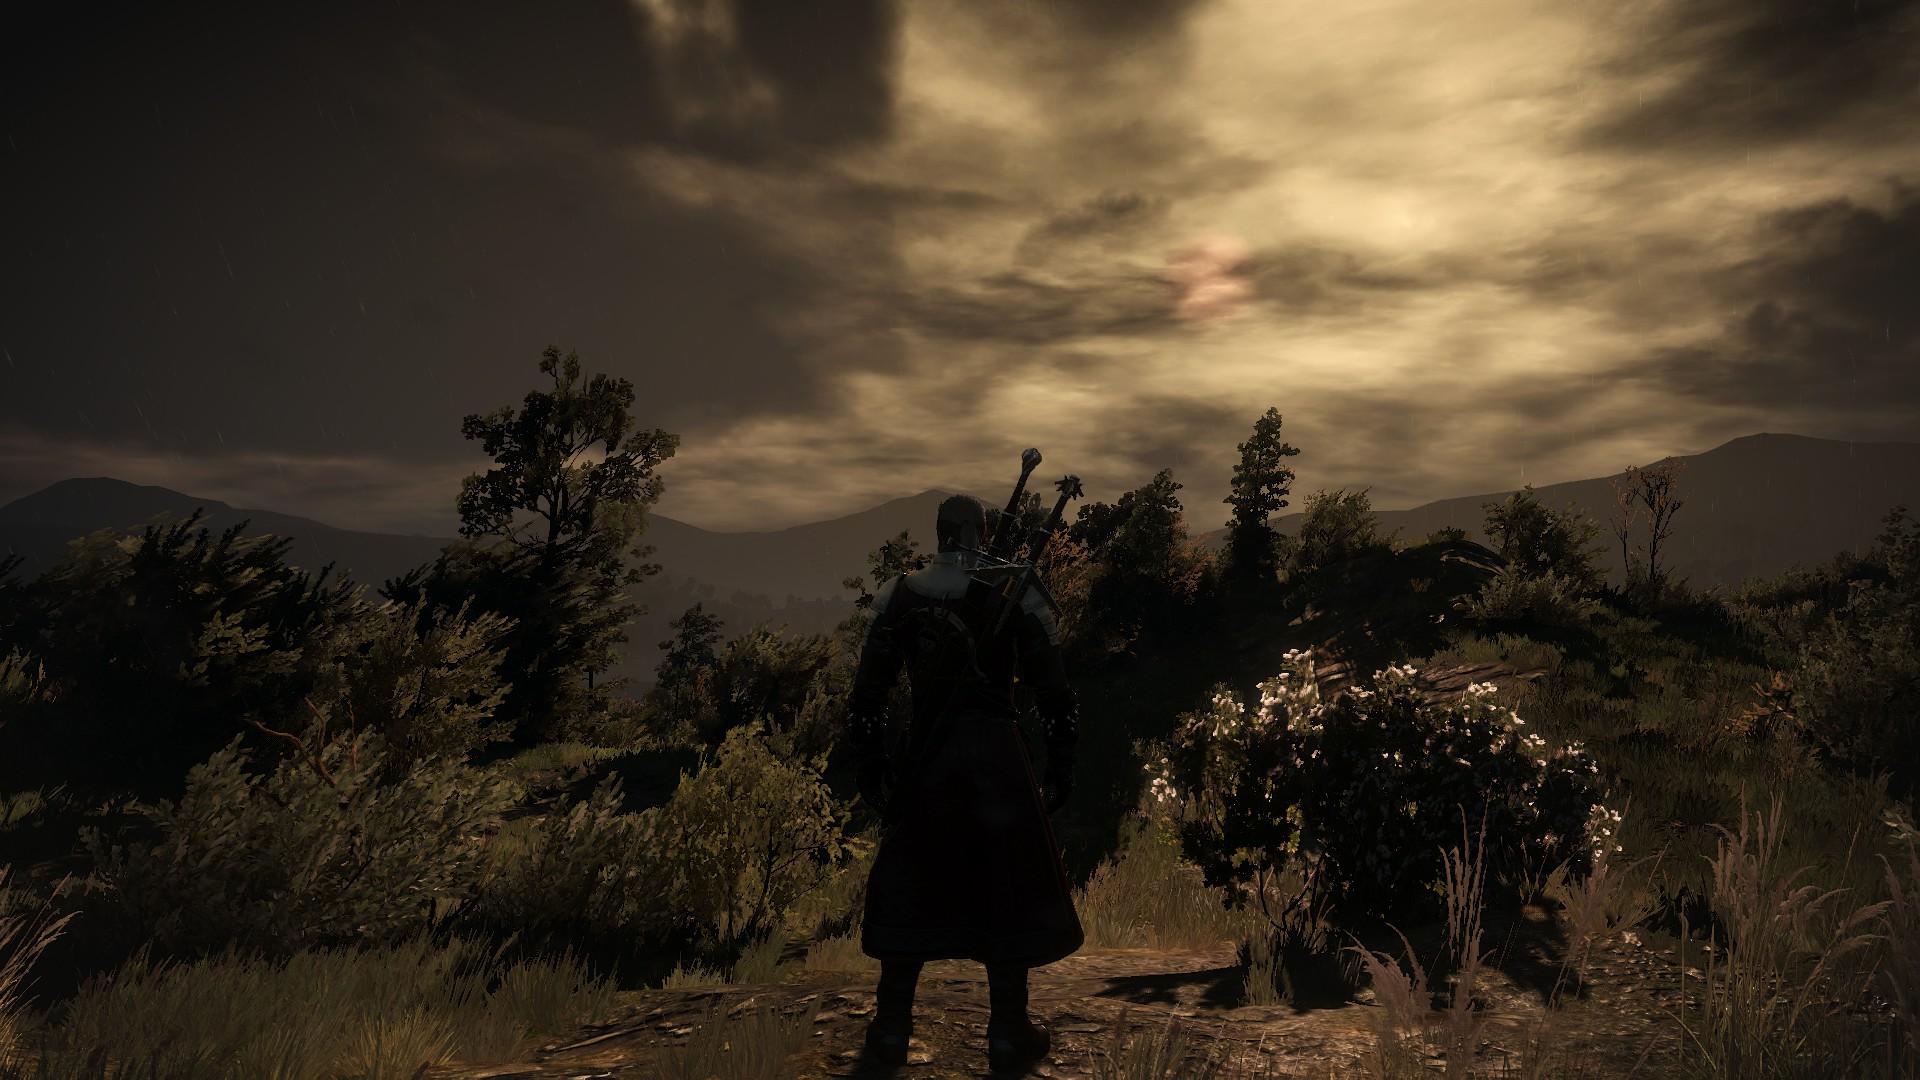 292030_screenshots_20190110002602_1.jpg - Witcher 3: Wild Hunt, the